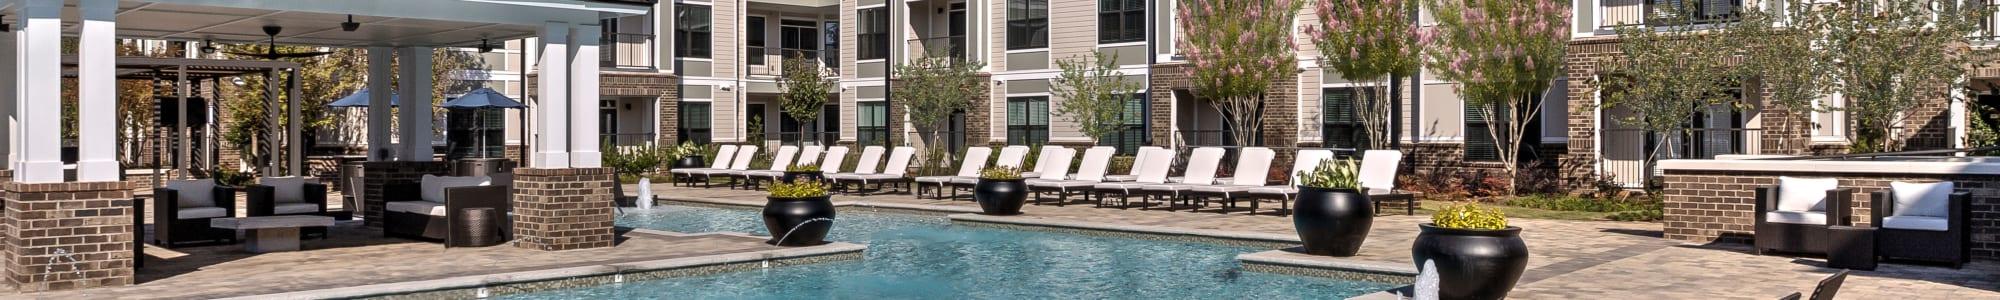 Reviews of our apartments in Alpharetta, GA